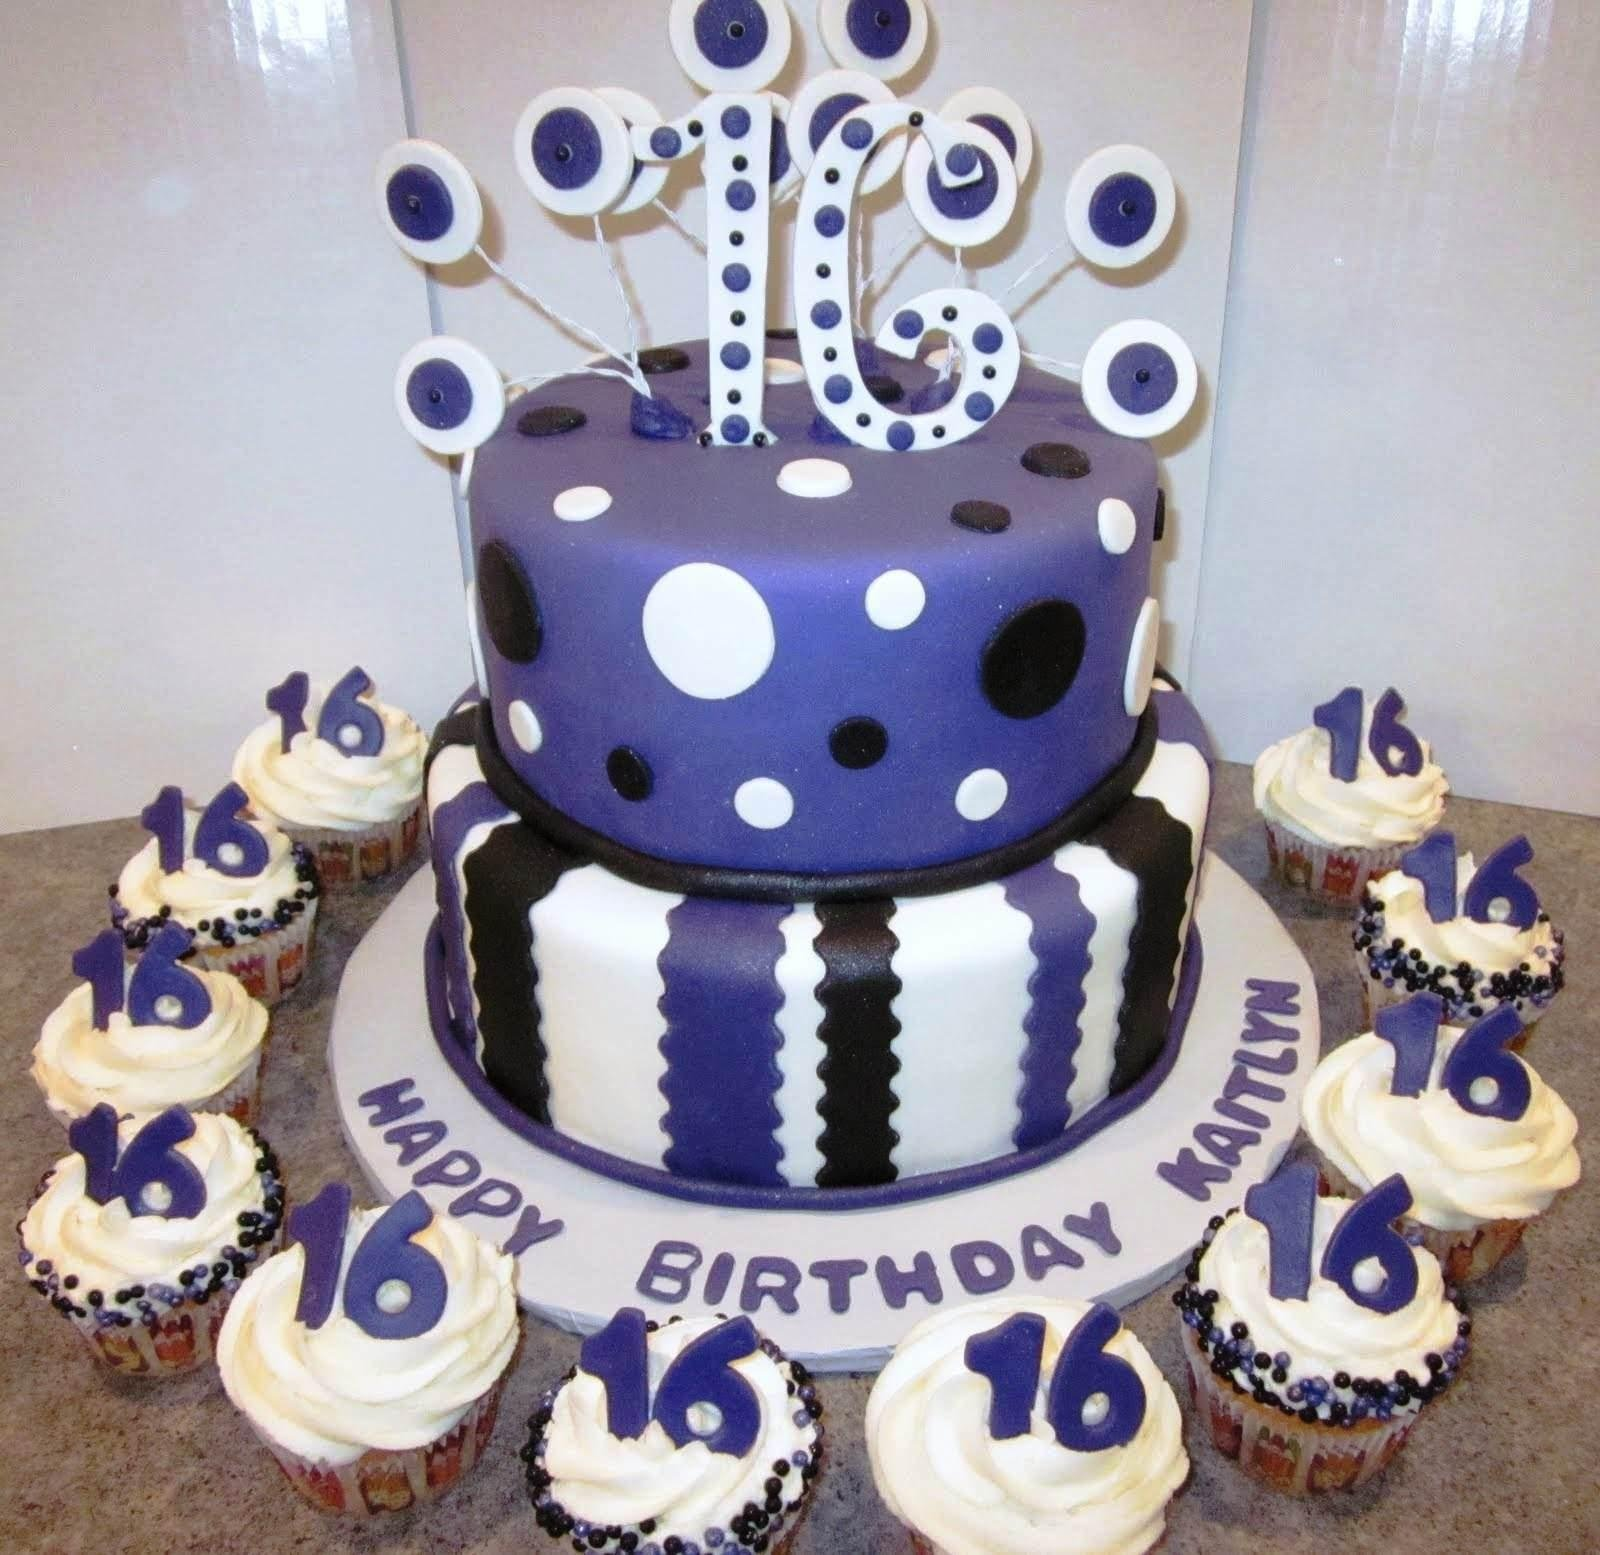 10 Ideal 16Th Birthday Cake Ideas For Boys pinrhonda walker on boys 16th birthday party pinterest 16th 4